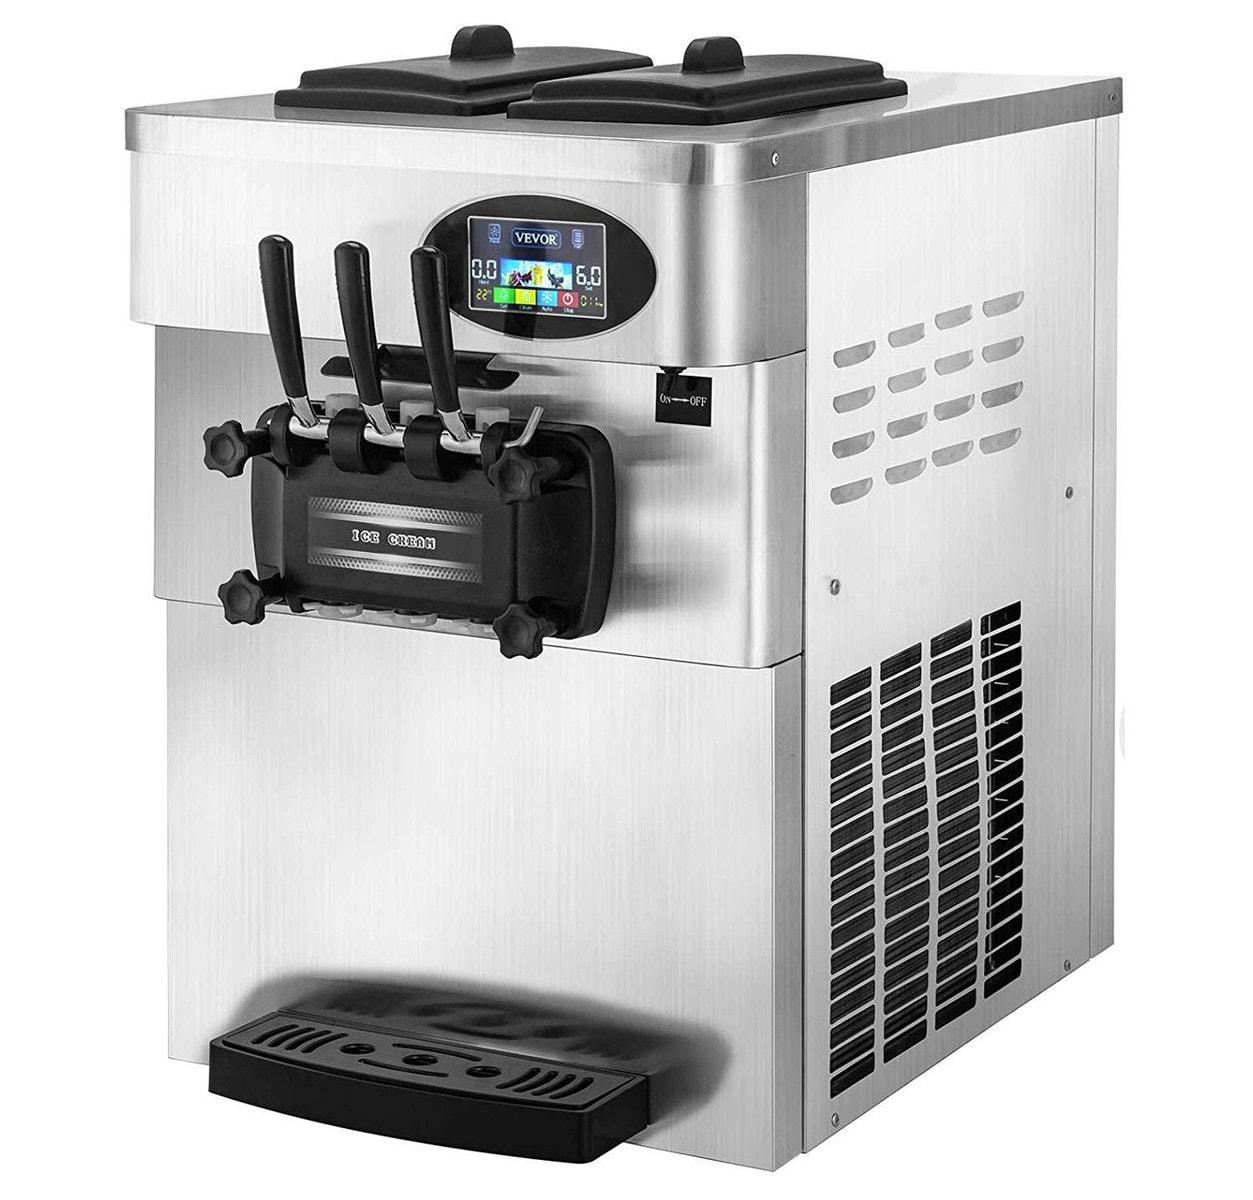 VEVOR Commercial Soft Served Ice Cream Machine